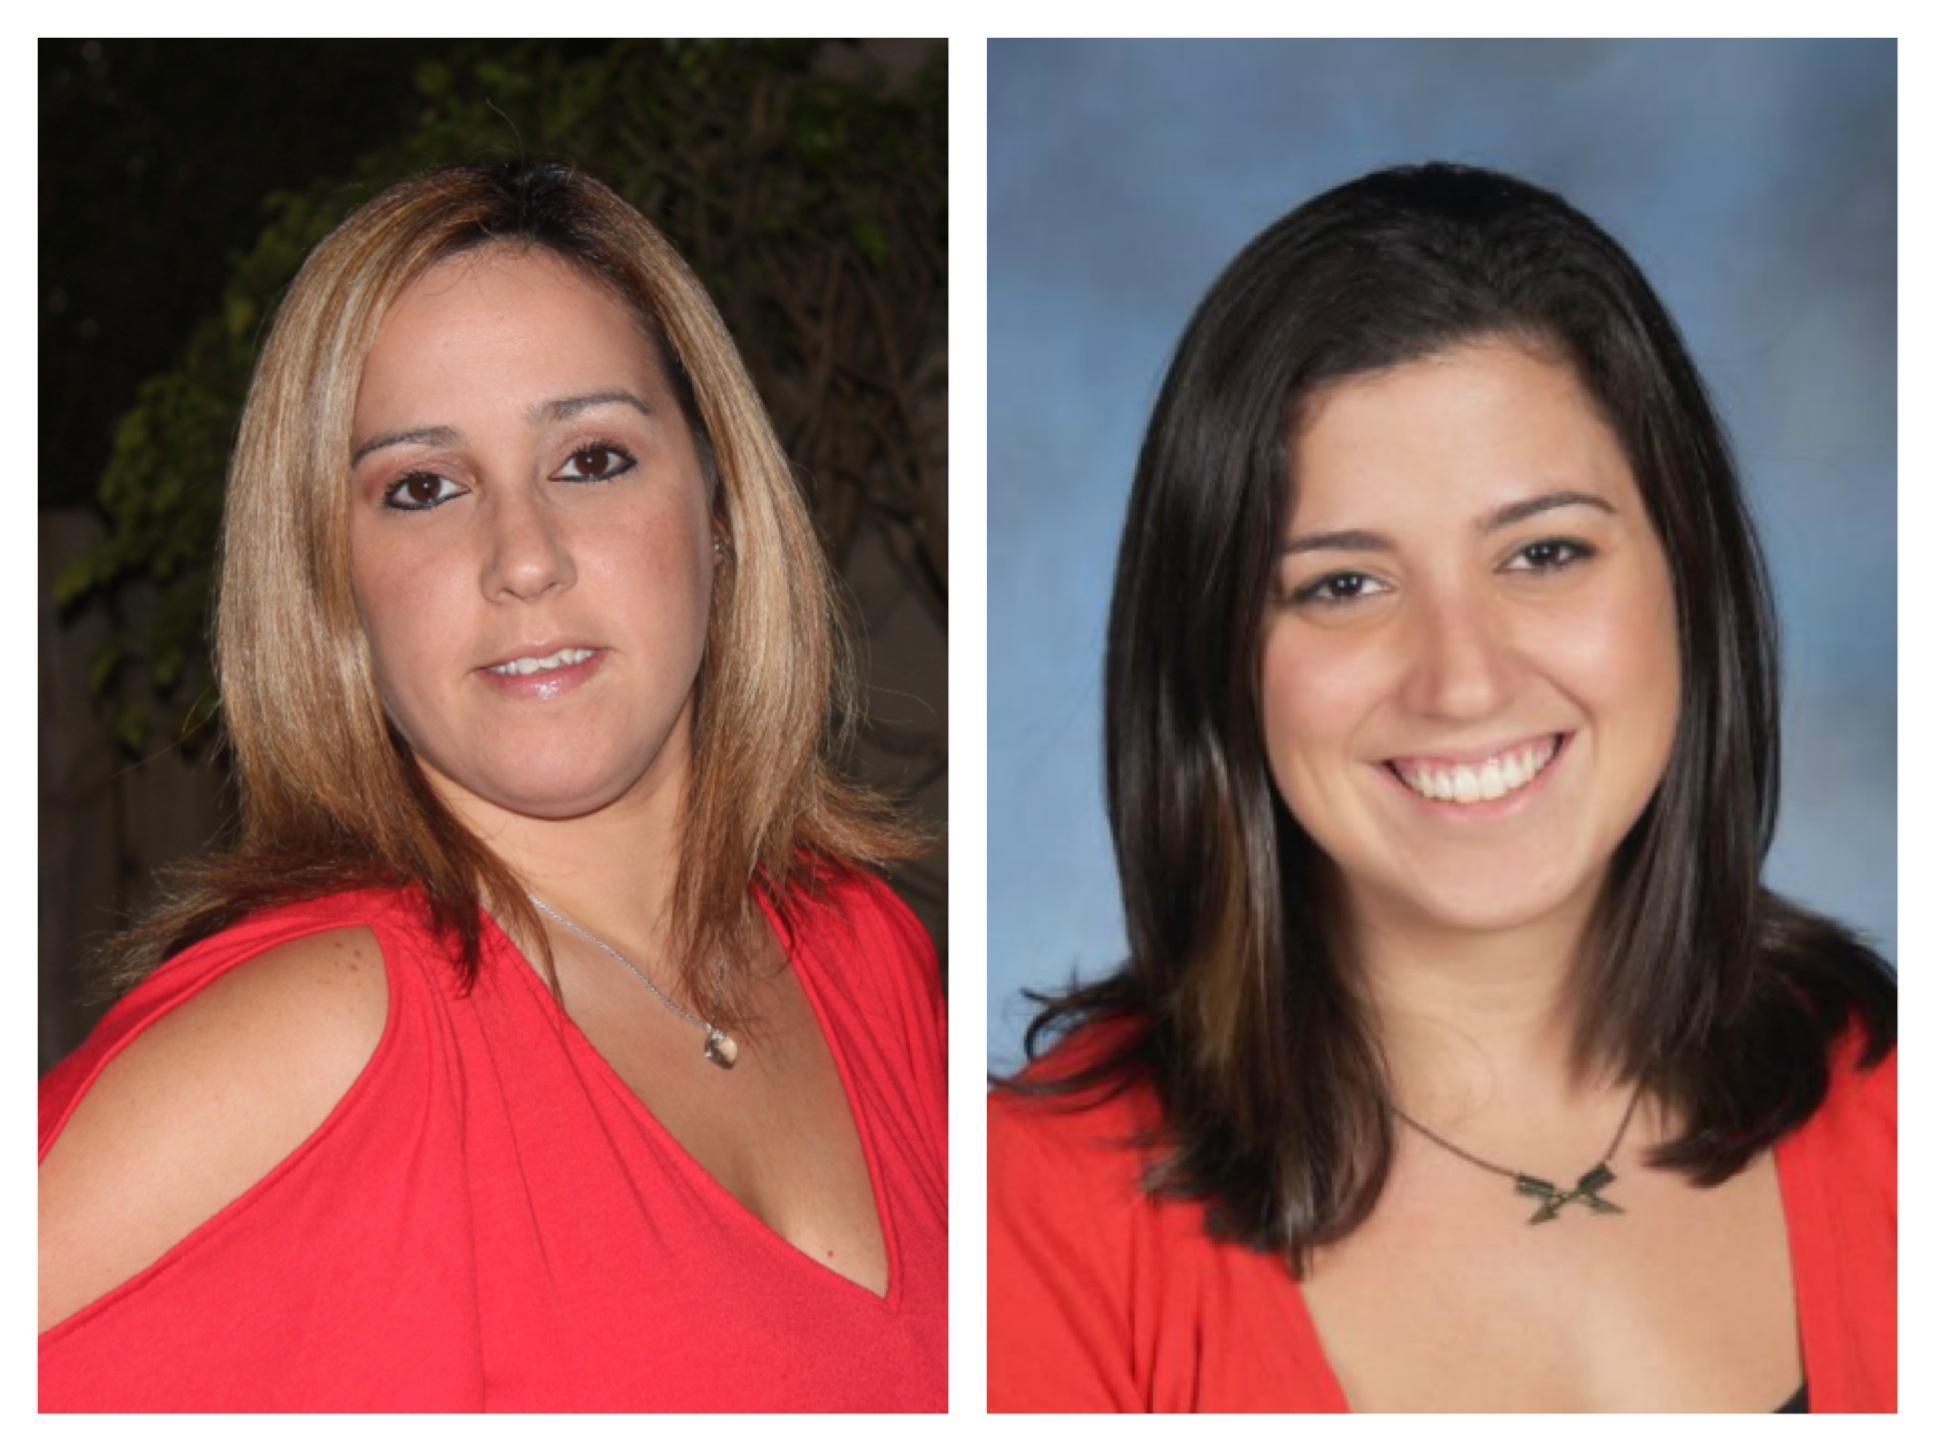 The 2013-2014 Coral Gables Teachers of the year. Ms. Alvarado (left) and Ms. Zaldivar (right).